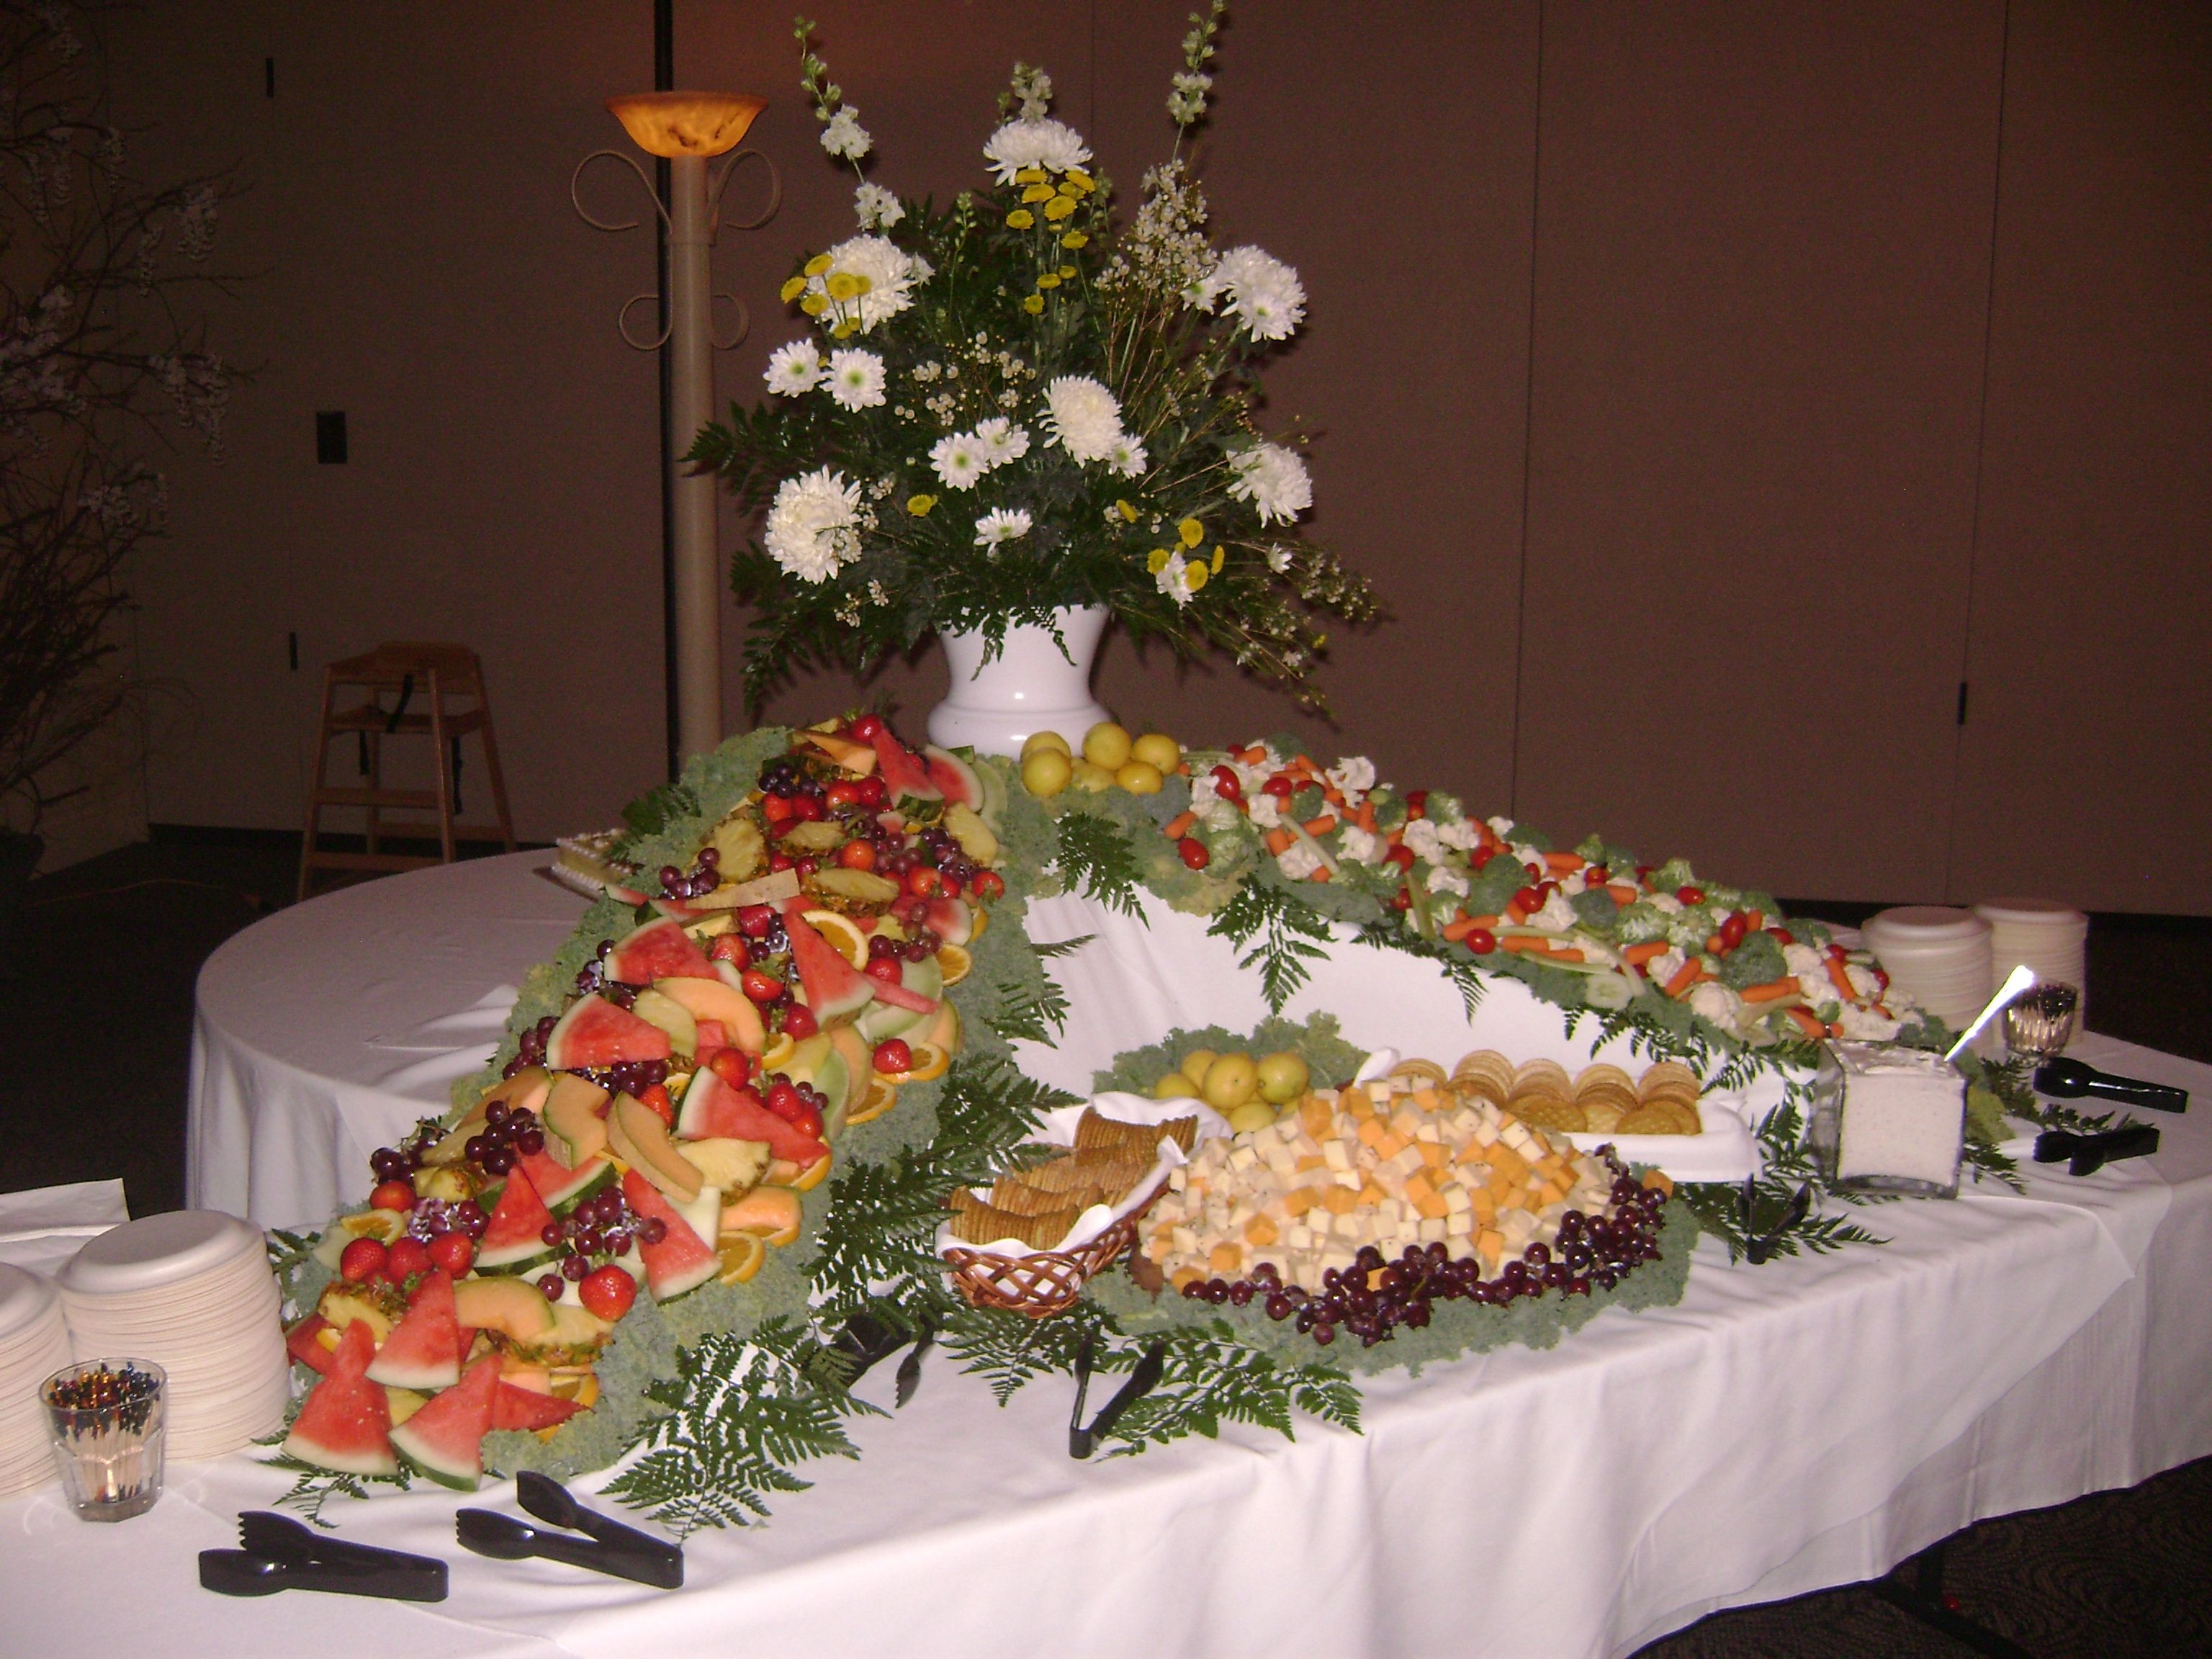 vegetable platter ideas   ... Vegetable Cascade can definitely add ...